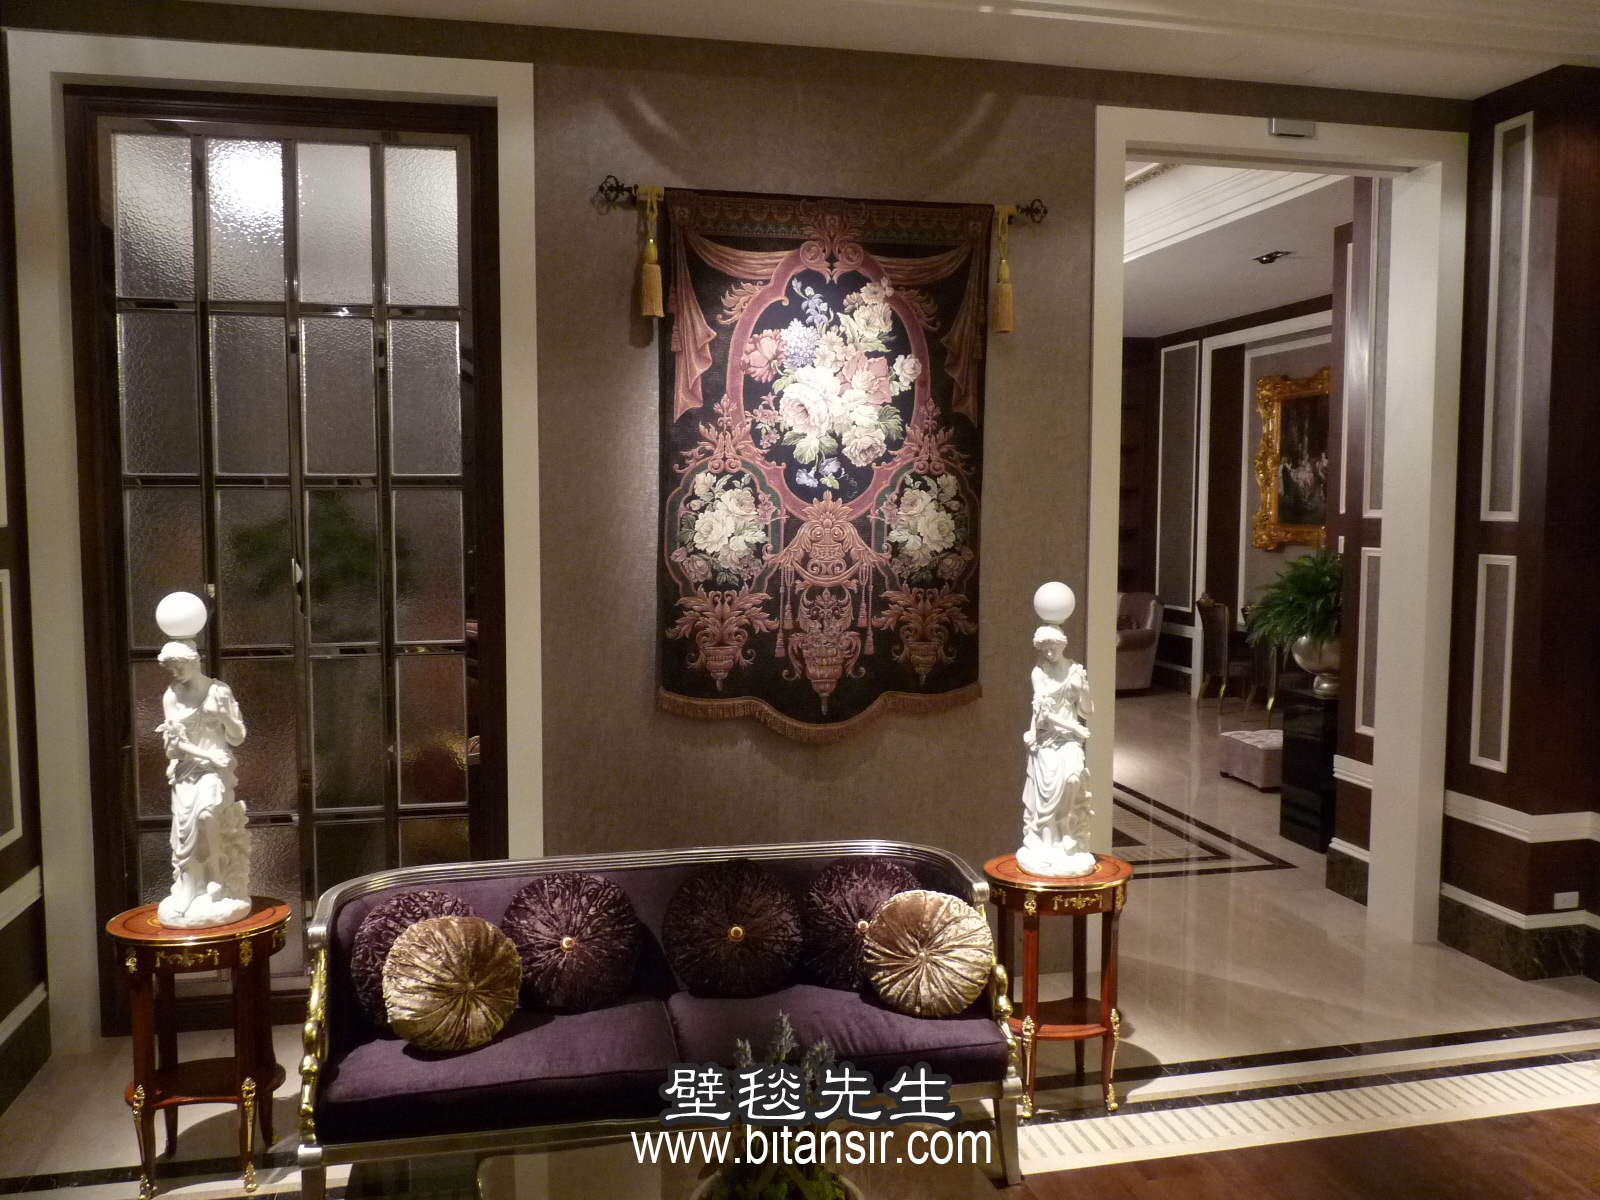 壁毯/掛毯/壁毯/挂毯